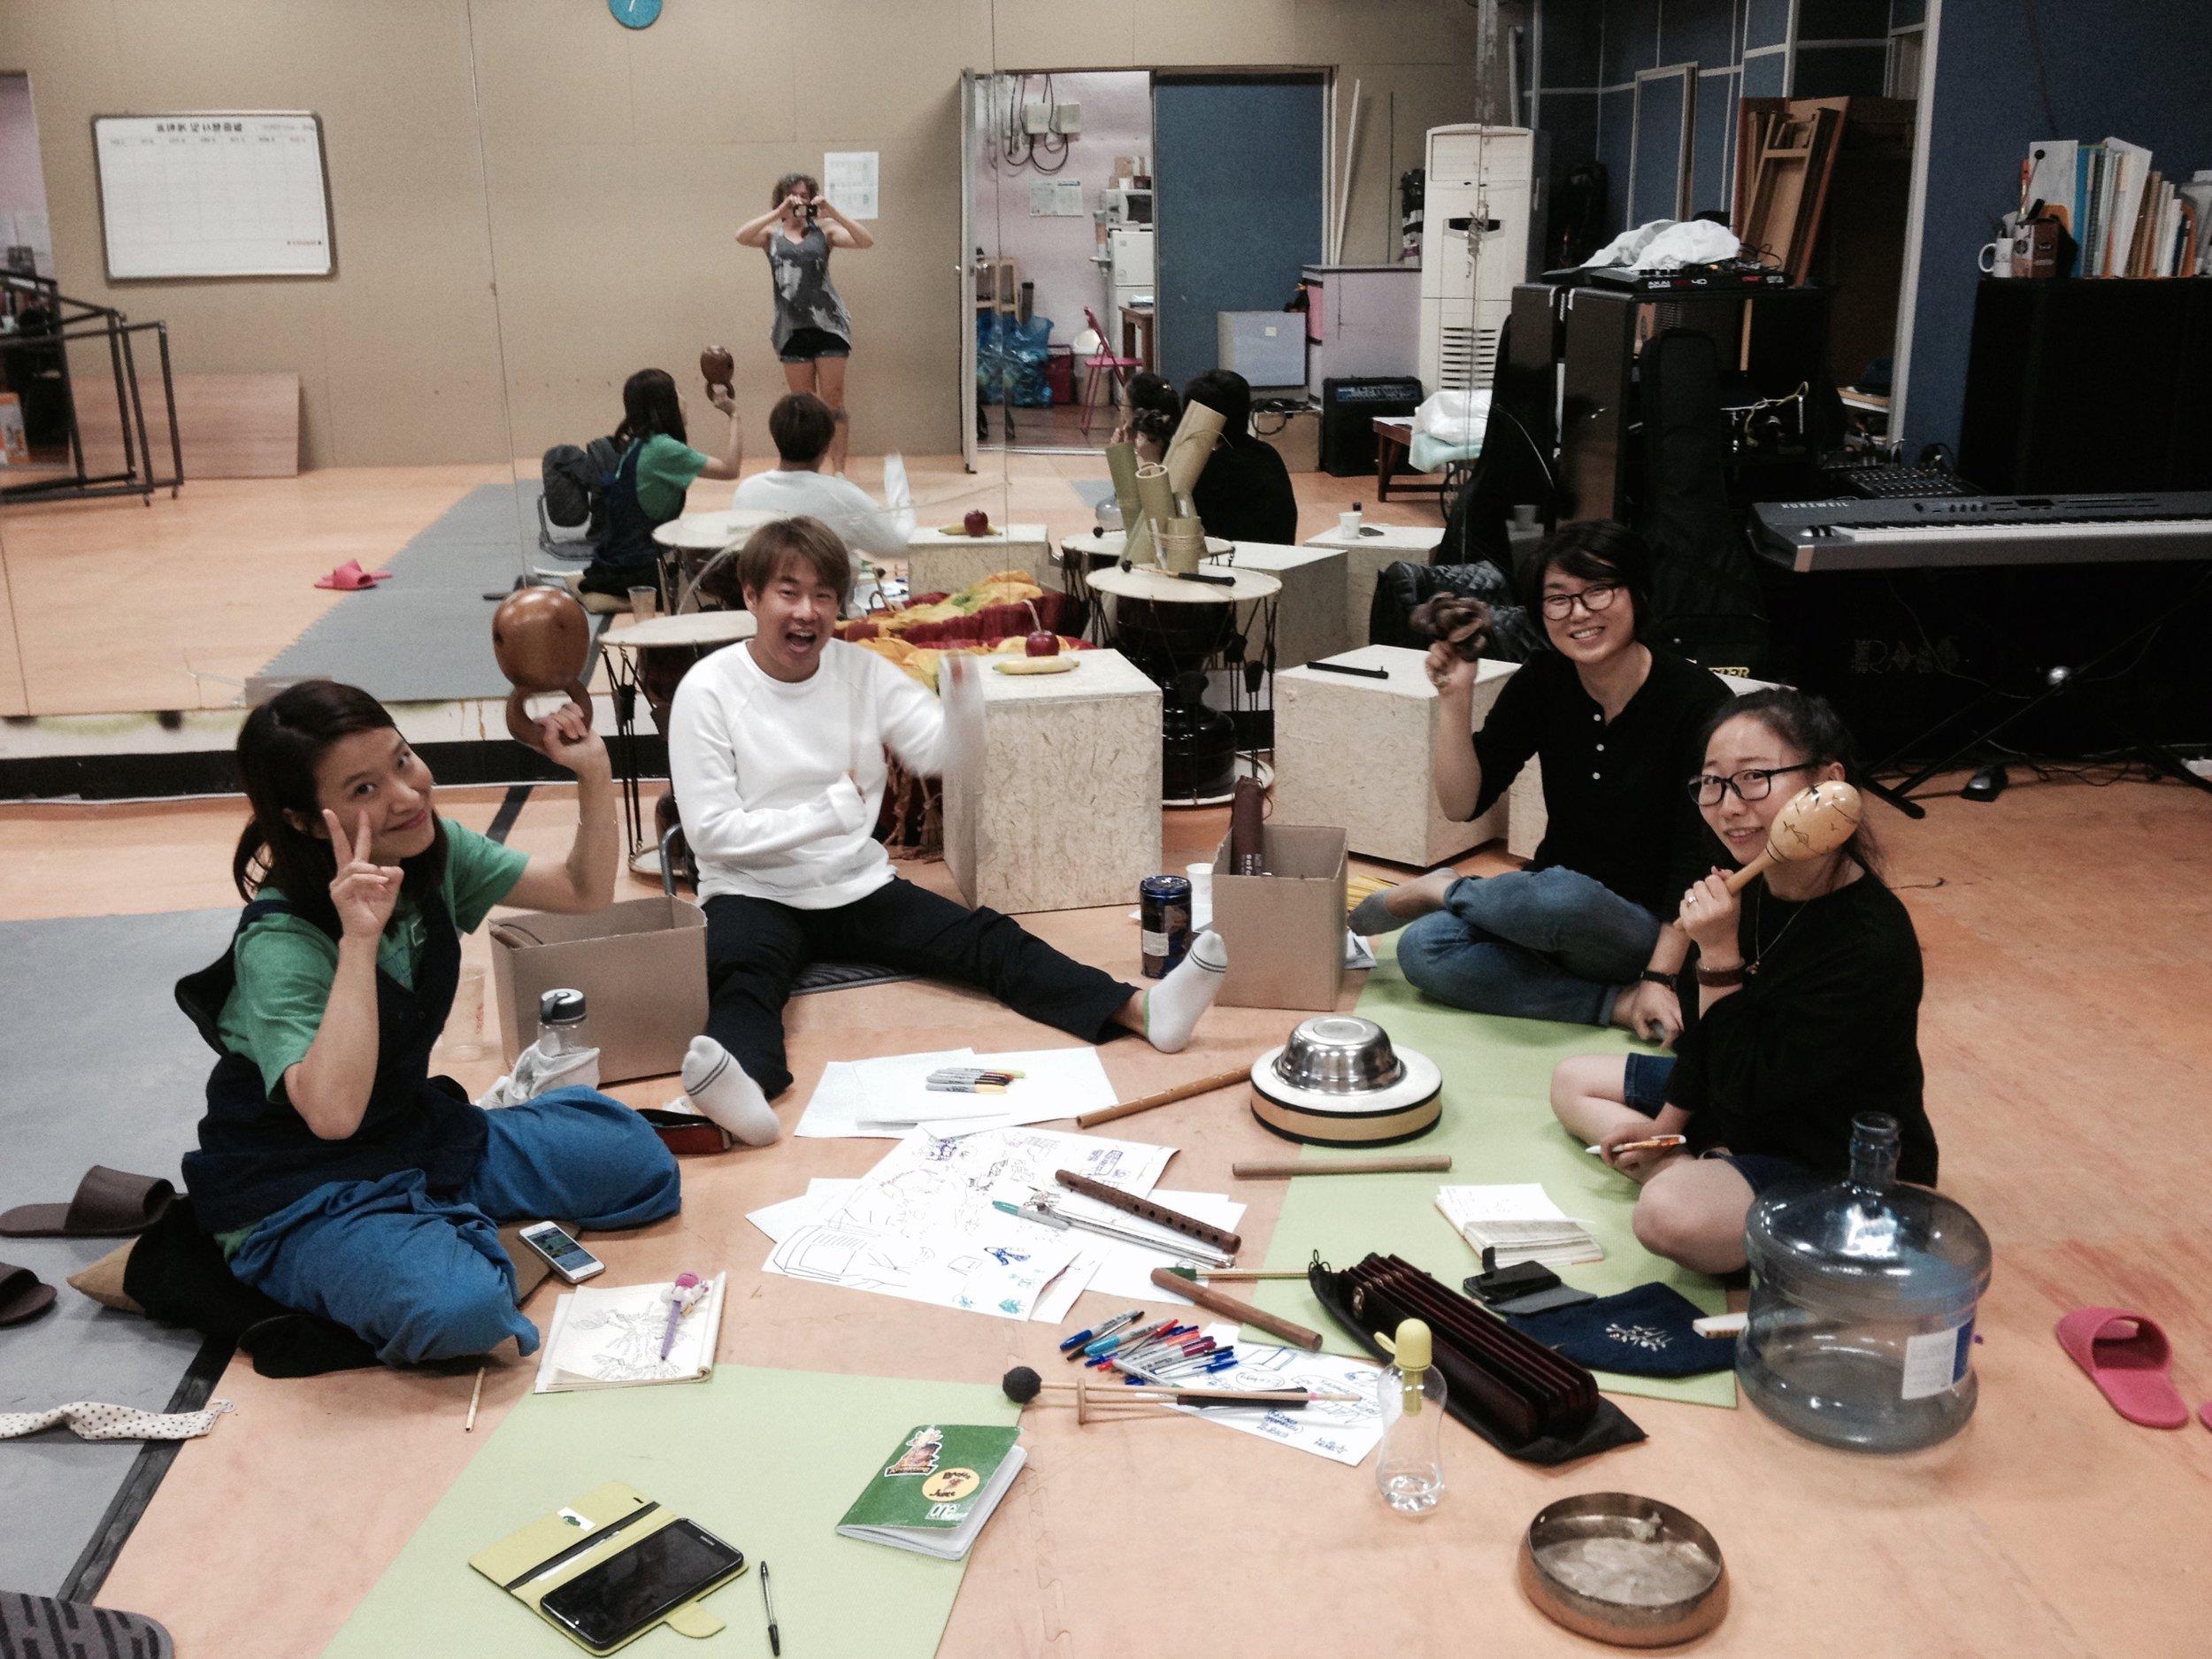 Soundscape exploration! (Left to Right Bora, Jongim, Kyunghwa, Haeweon)